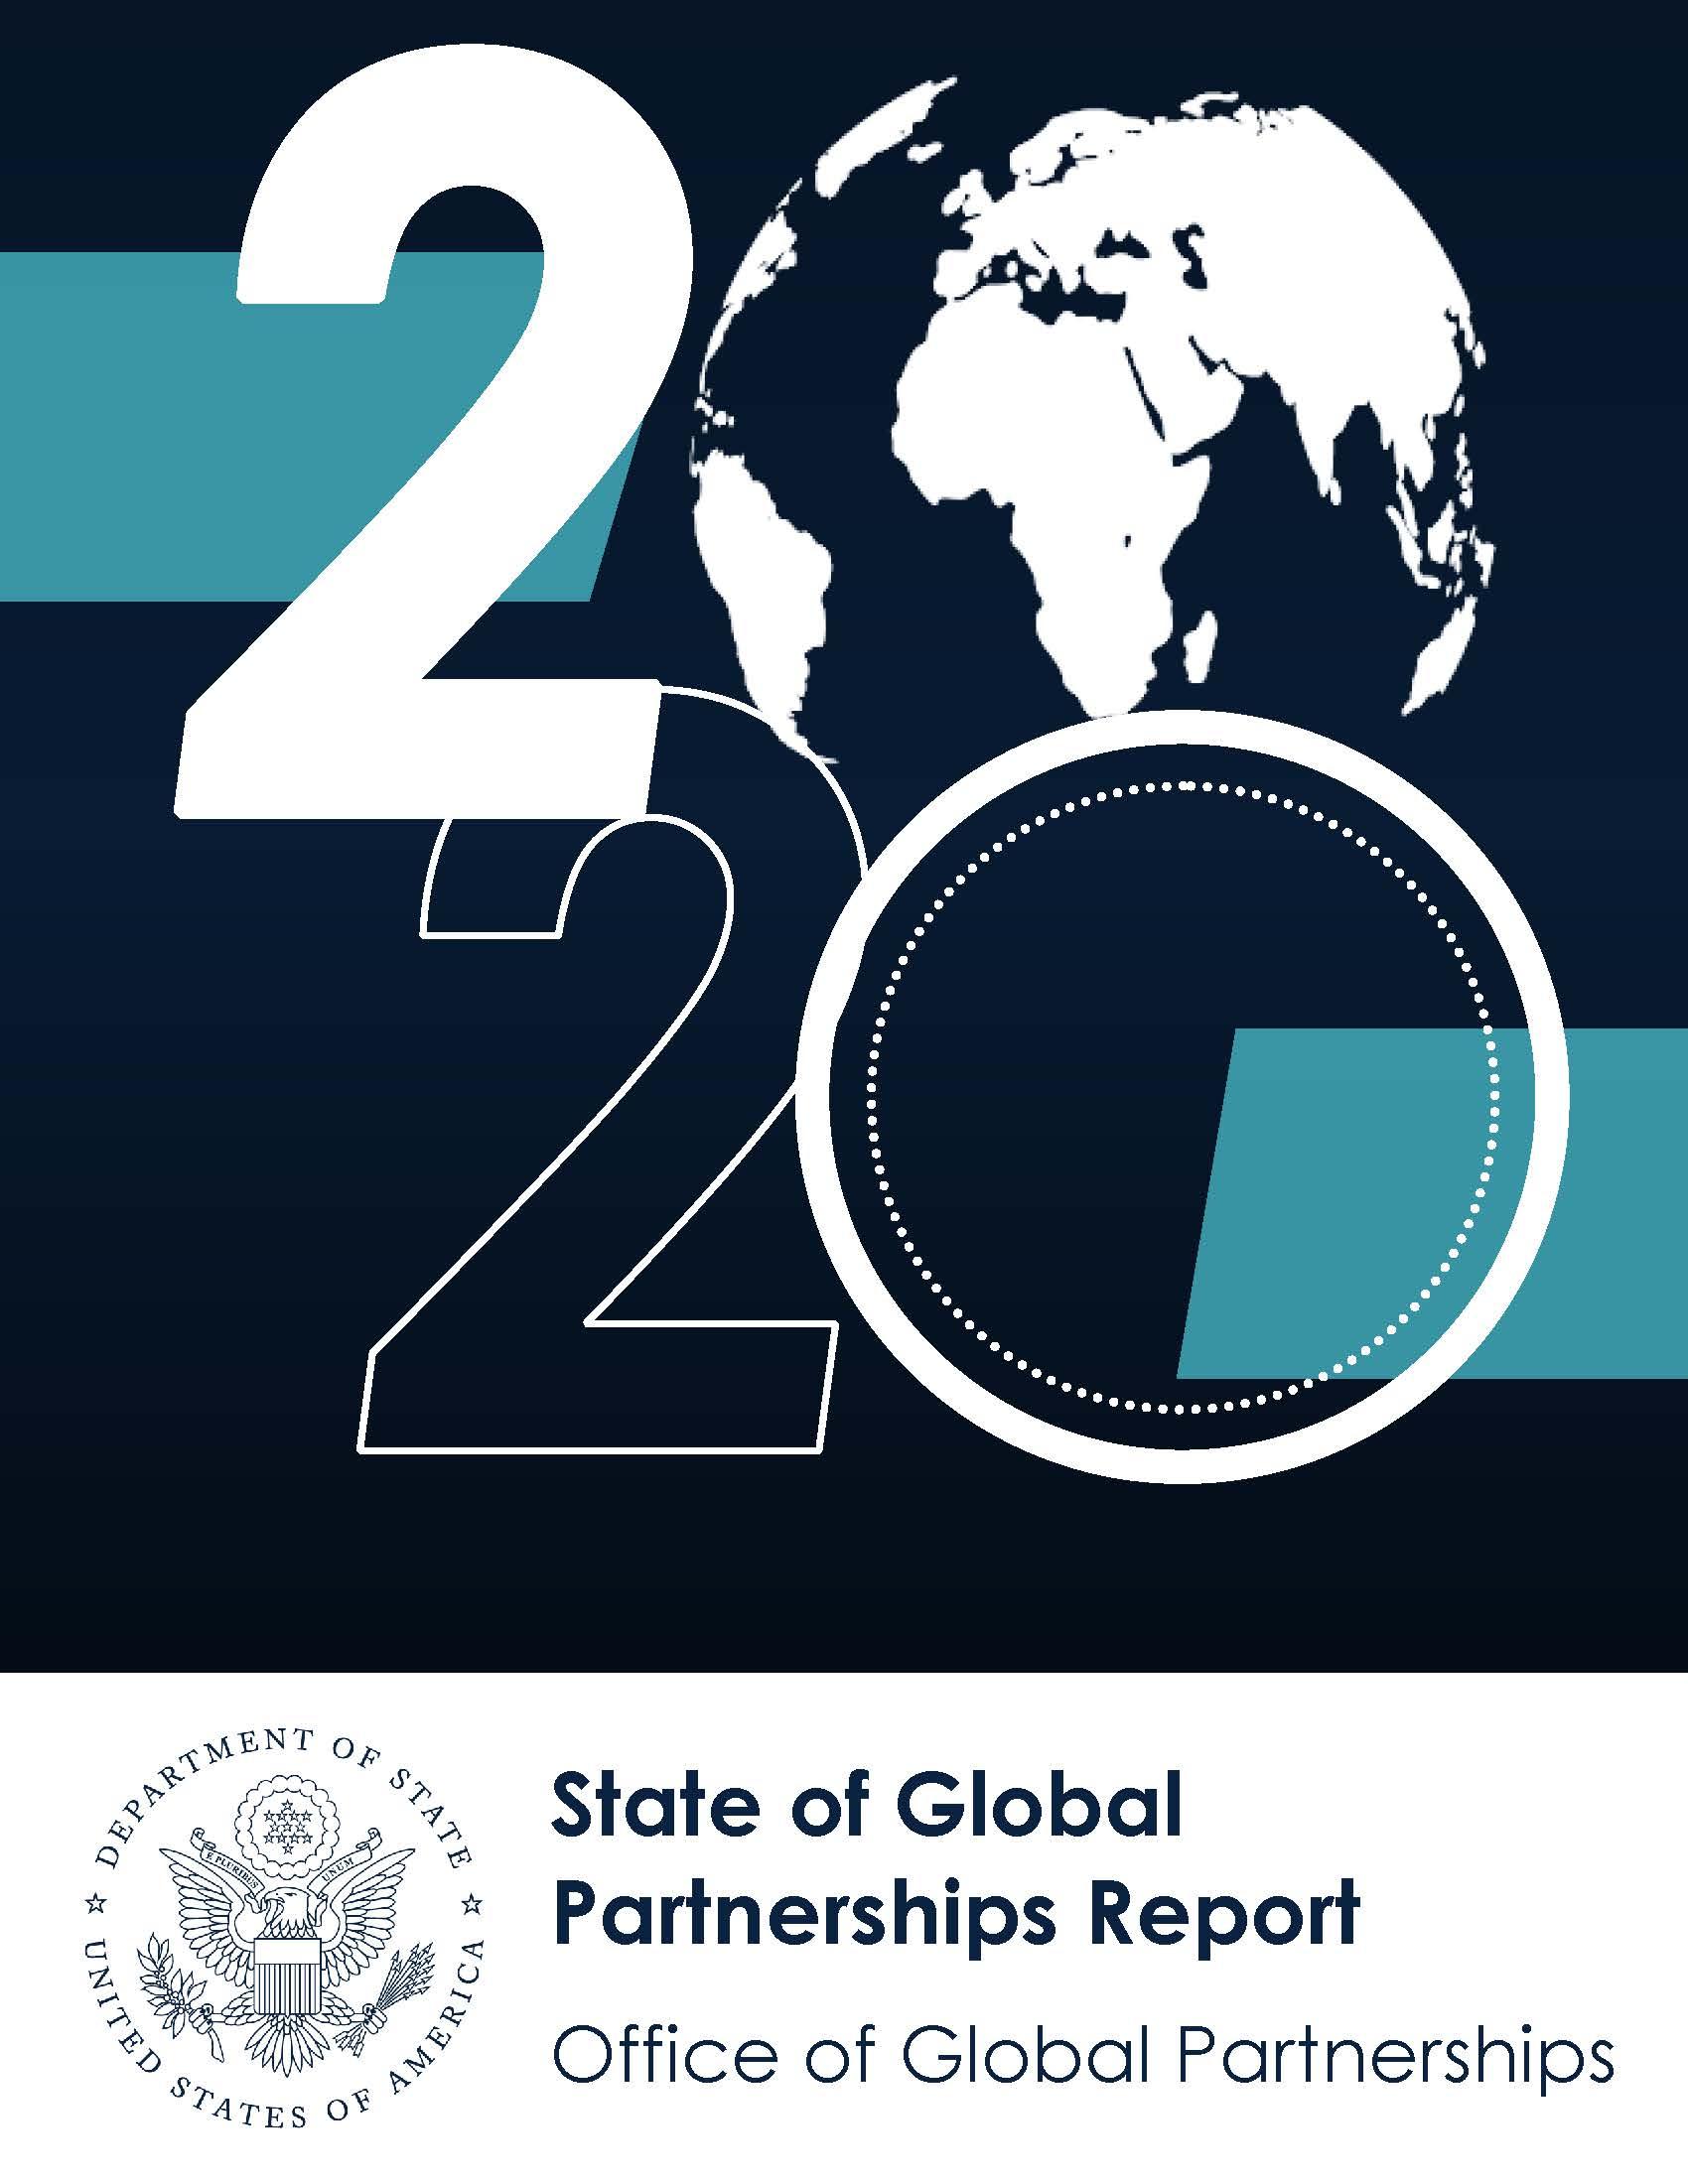 Global Partnerships 2020 Report